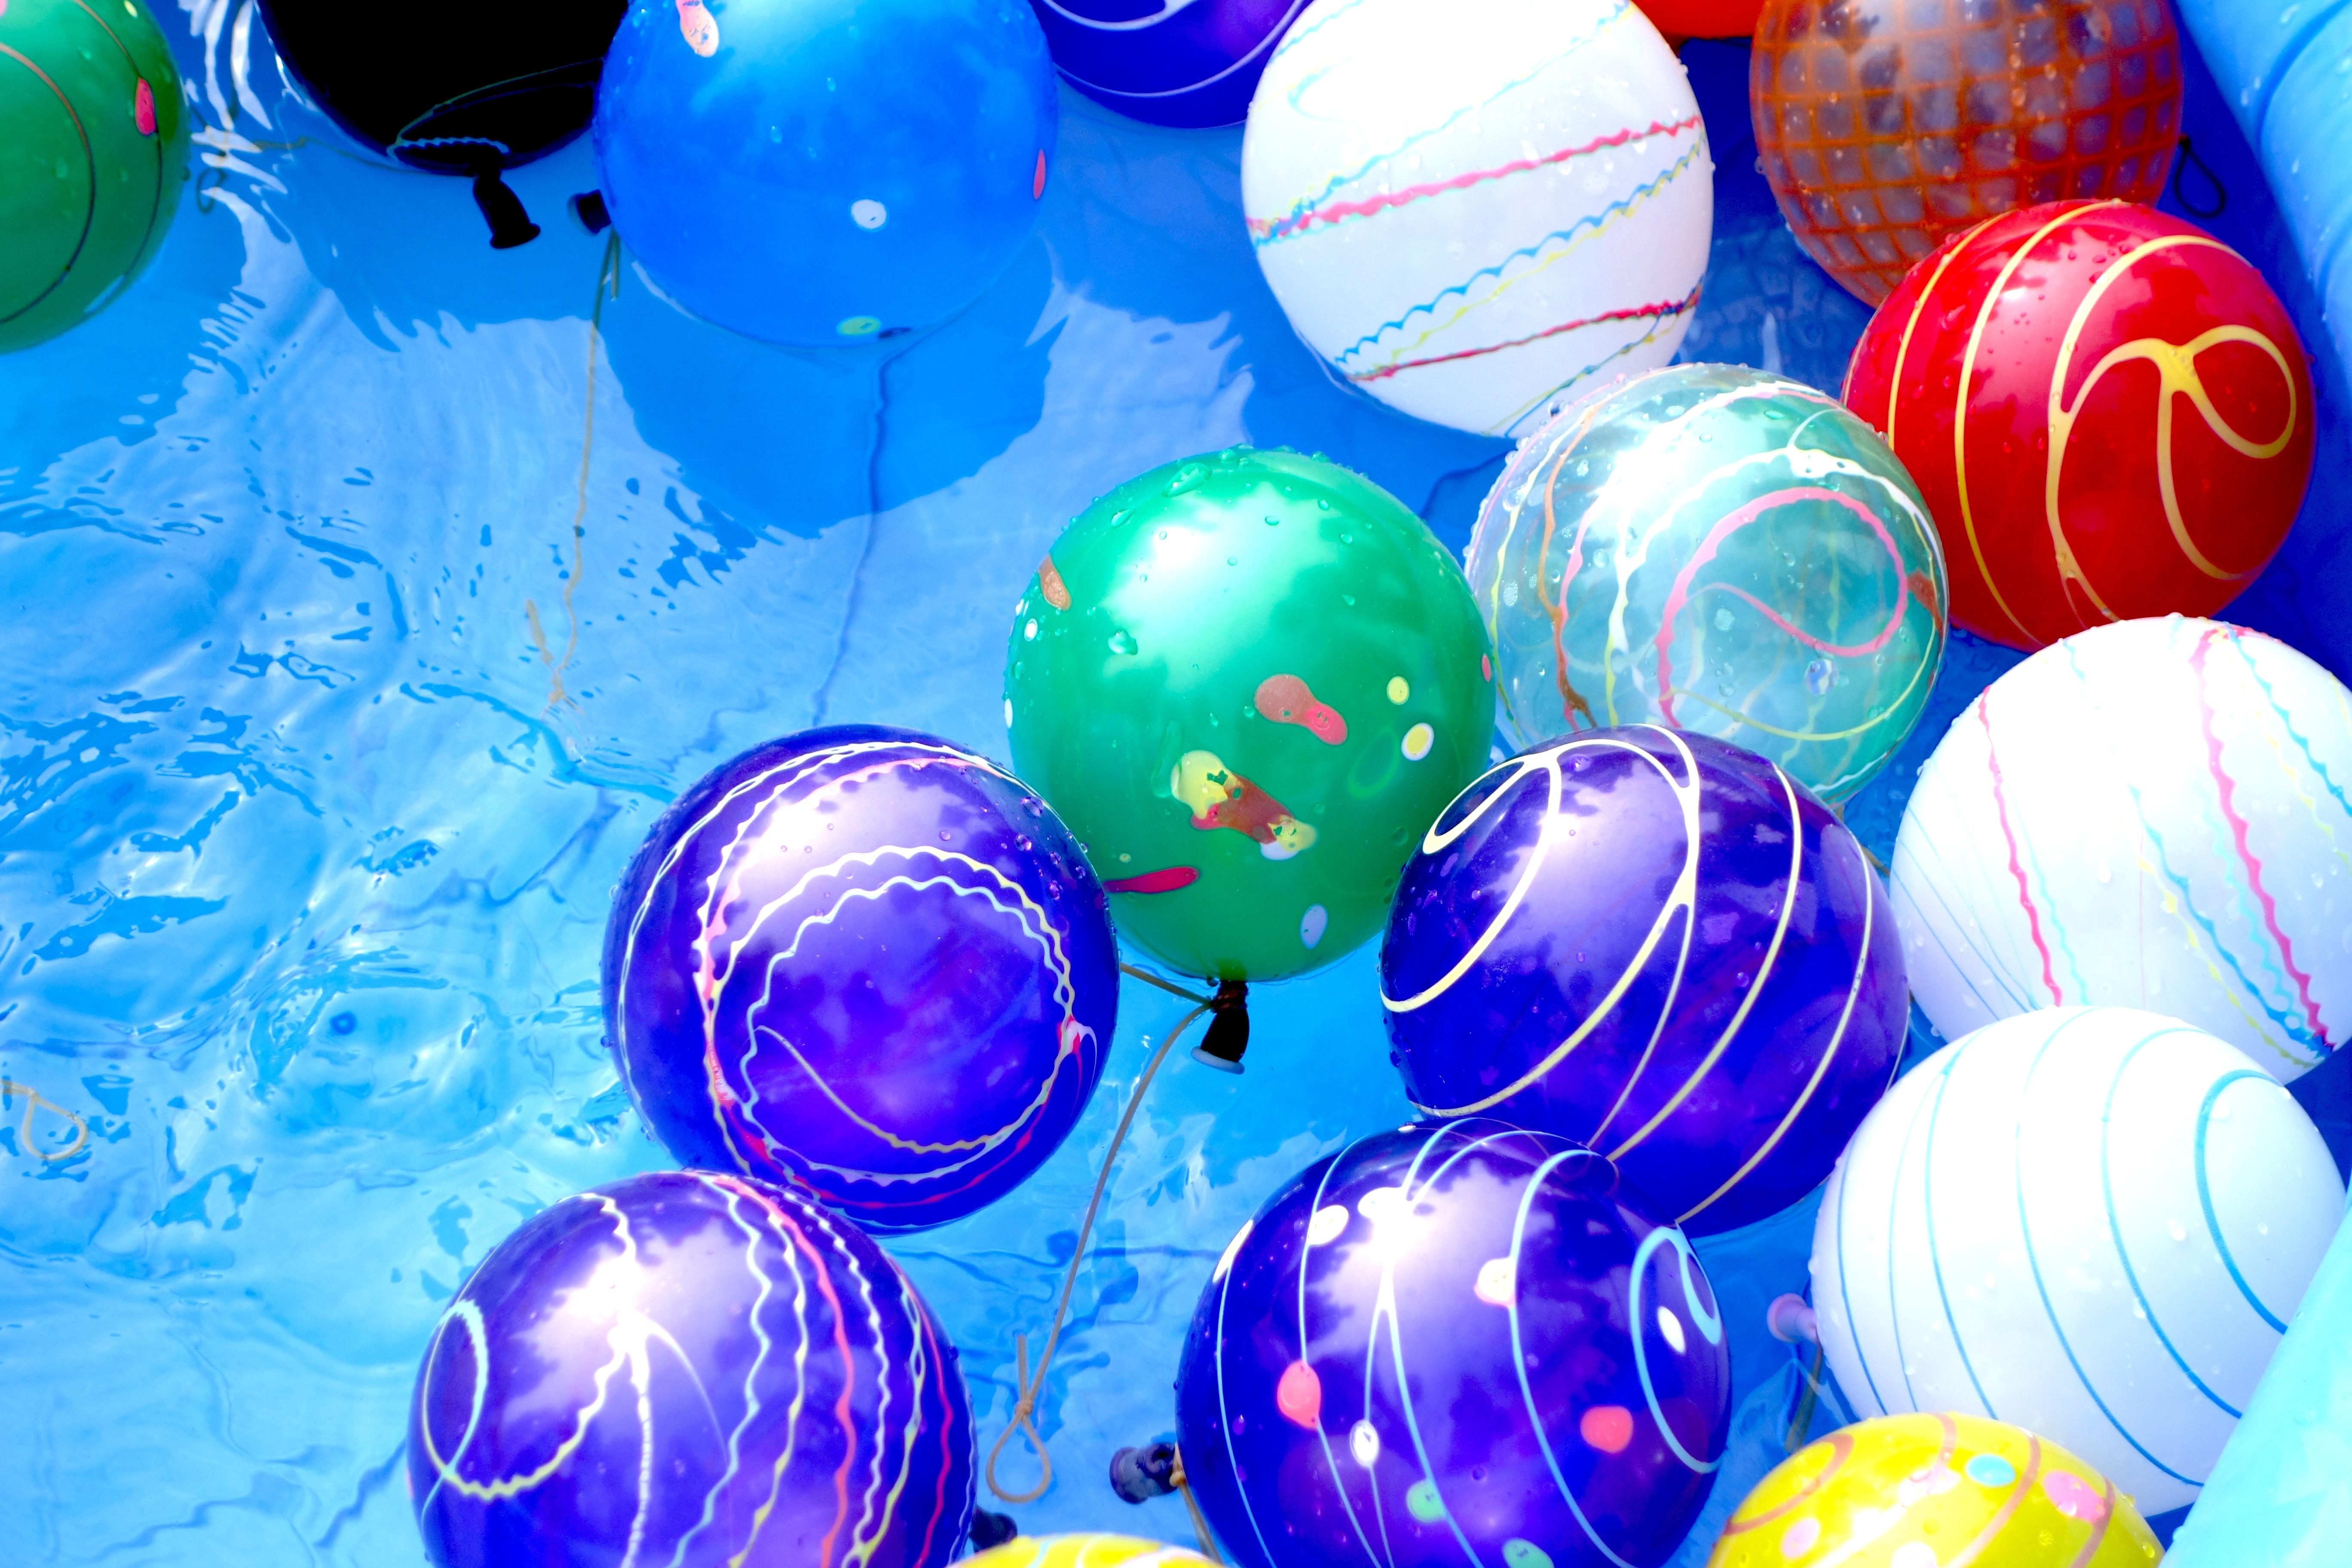 Water balloons, Japan Matsuri Festival 2014 Trafalgar Square